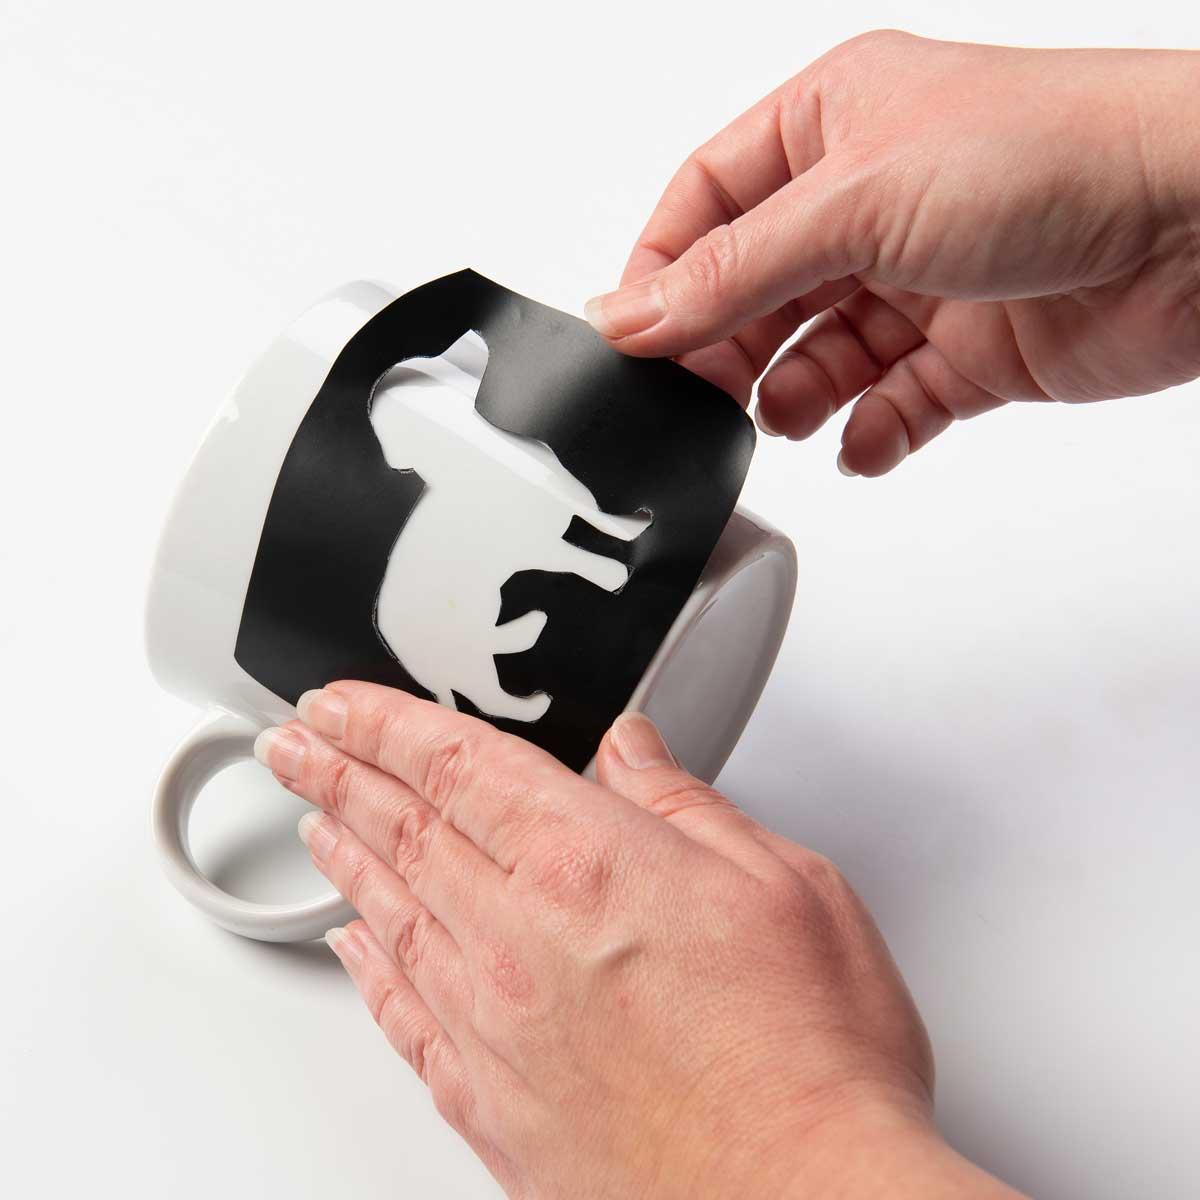 FolkArt ® Laser Cut Adhesive Stencils - Blank, 4 pc.